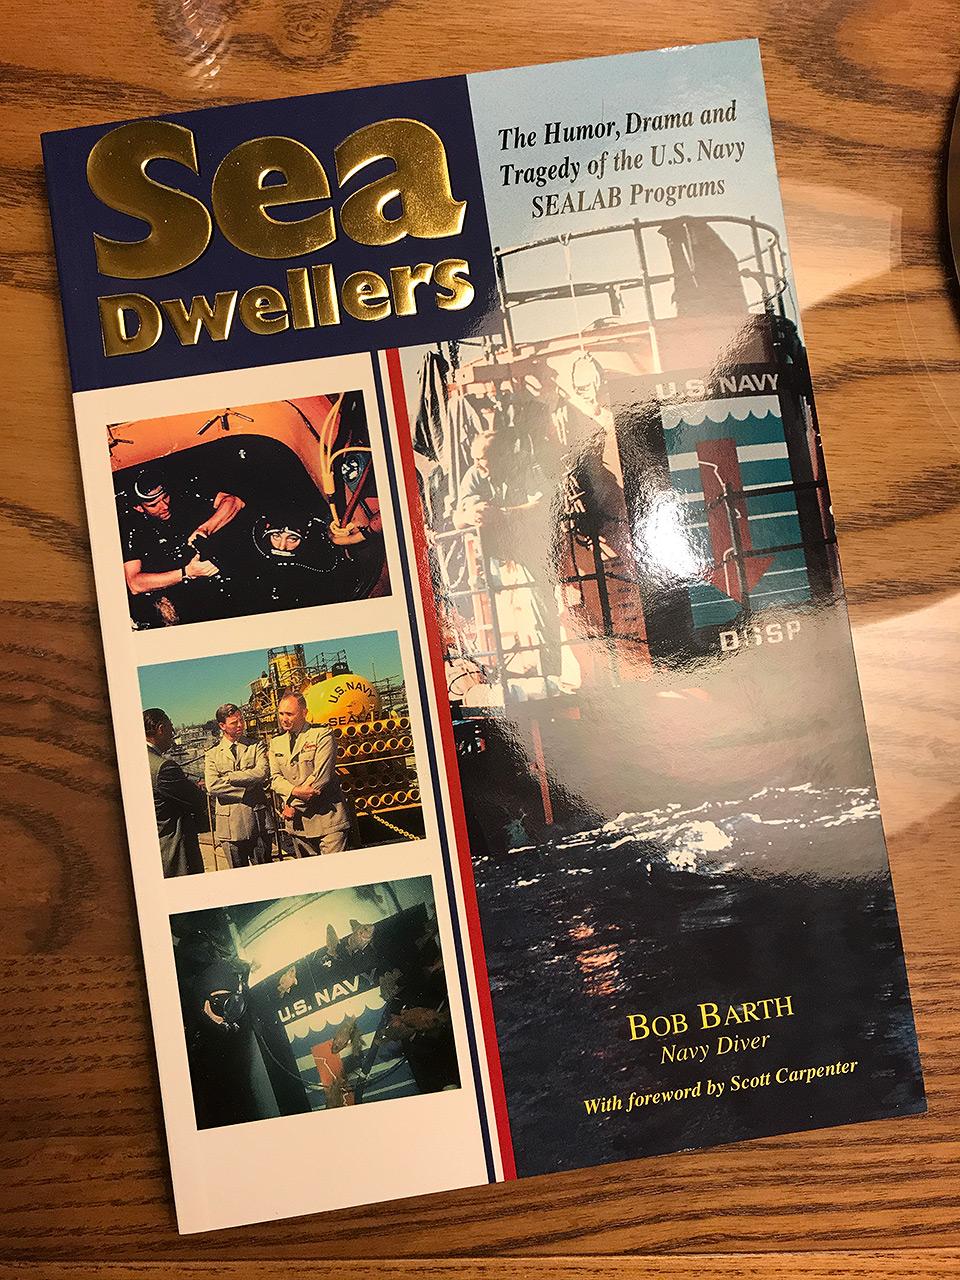 171022-bob-barth-sea-dweller-book-01